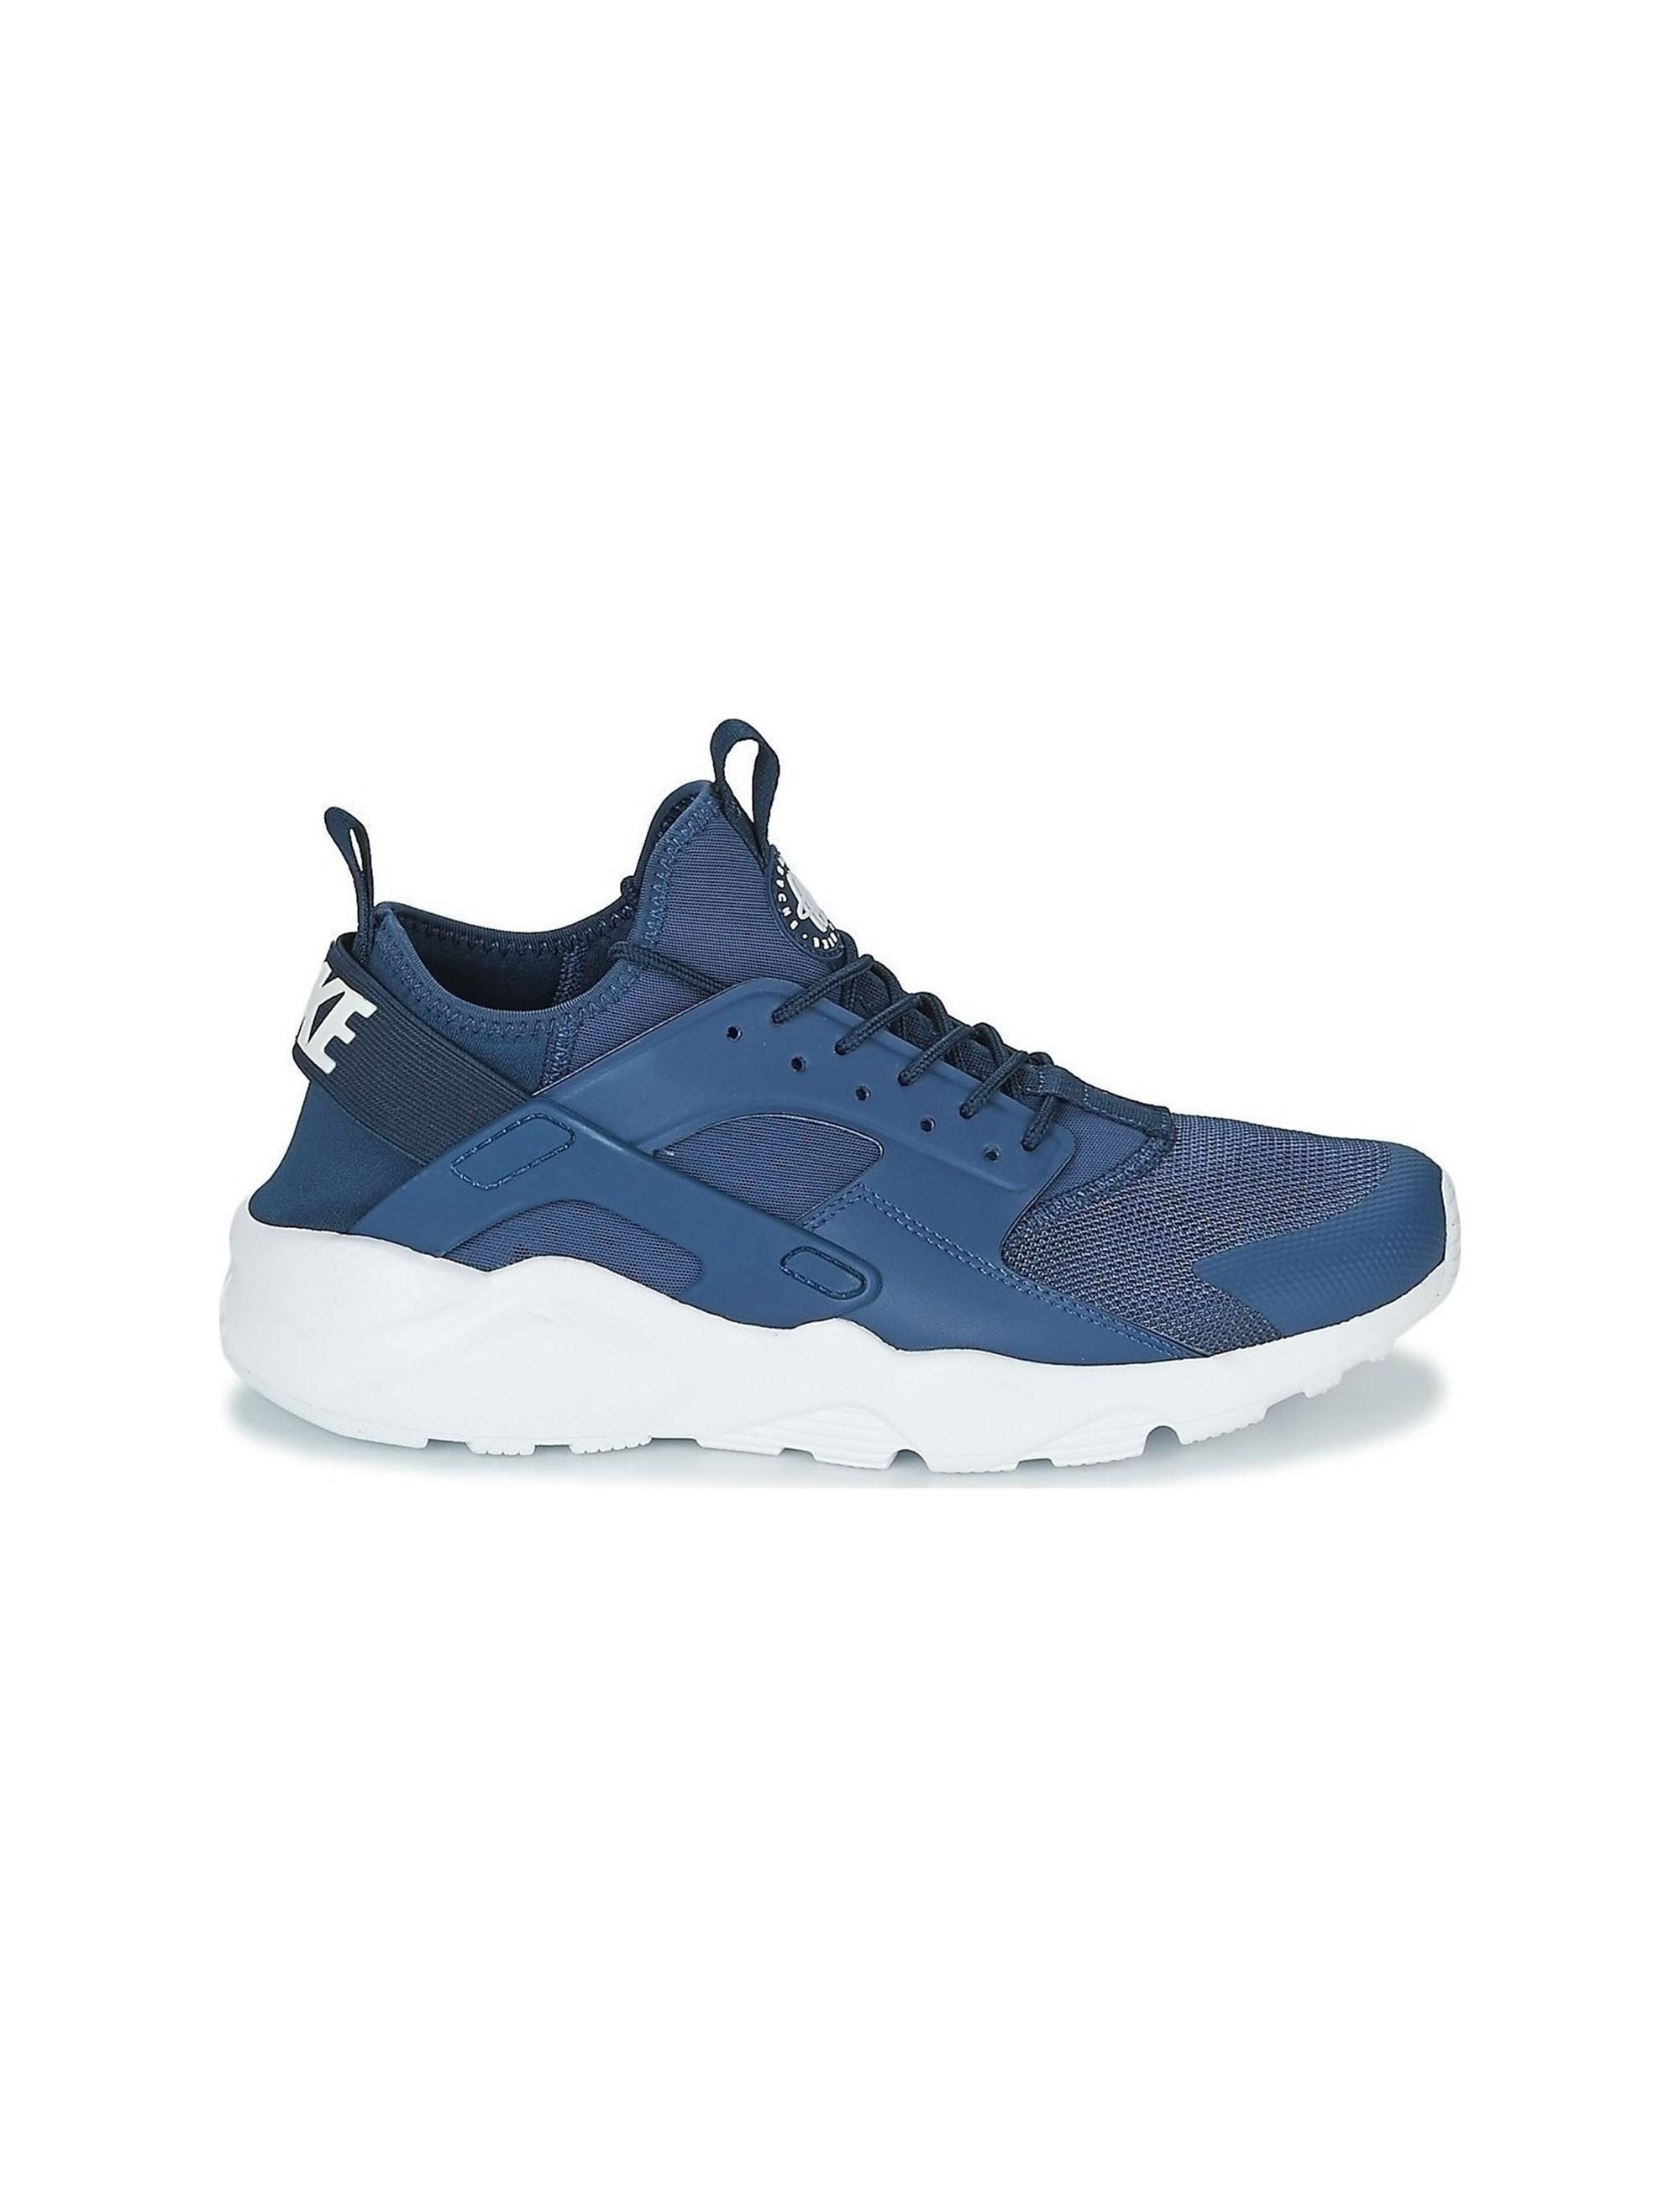 قیمت کفش دویدن بندی مردانه Air Huarache Ultra - نایکی